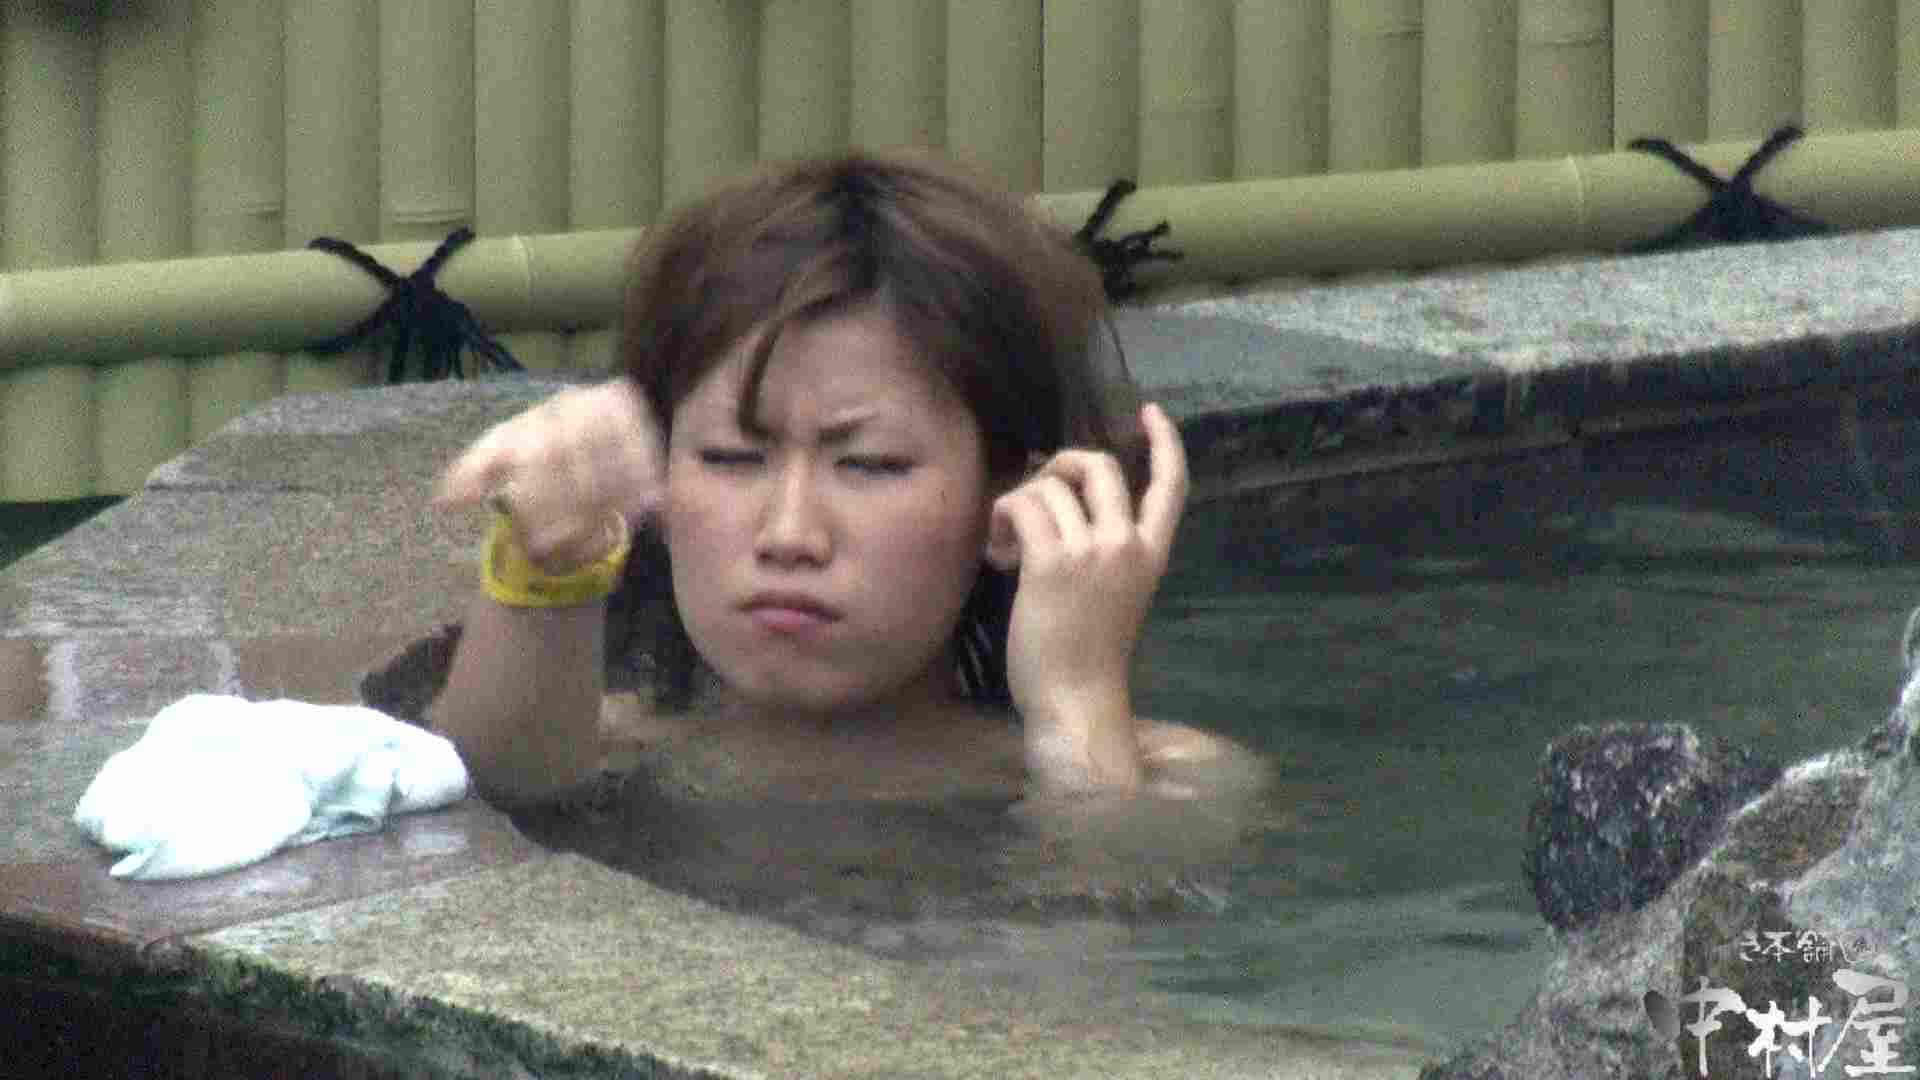 Aquaな露天風呂Vol.918 露天風呂突入 おまんこ無修正動画無料 75pic 53